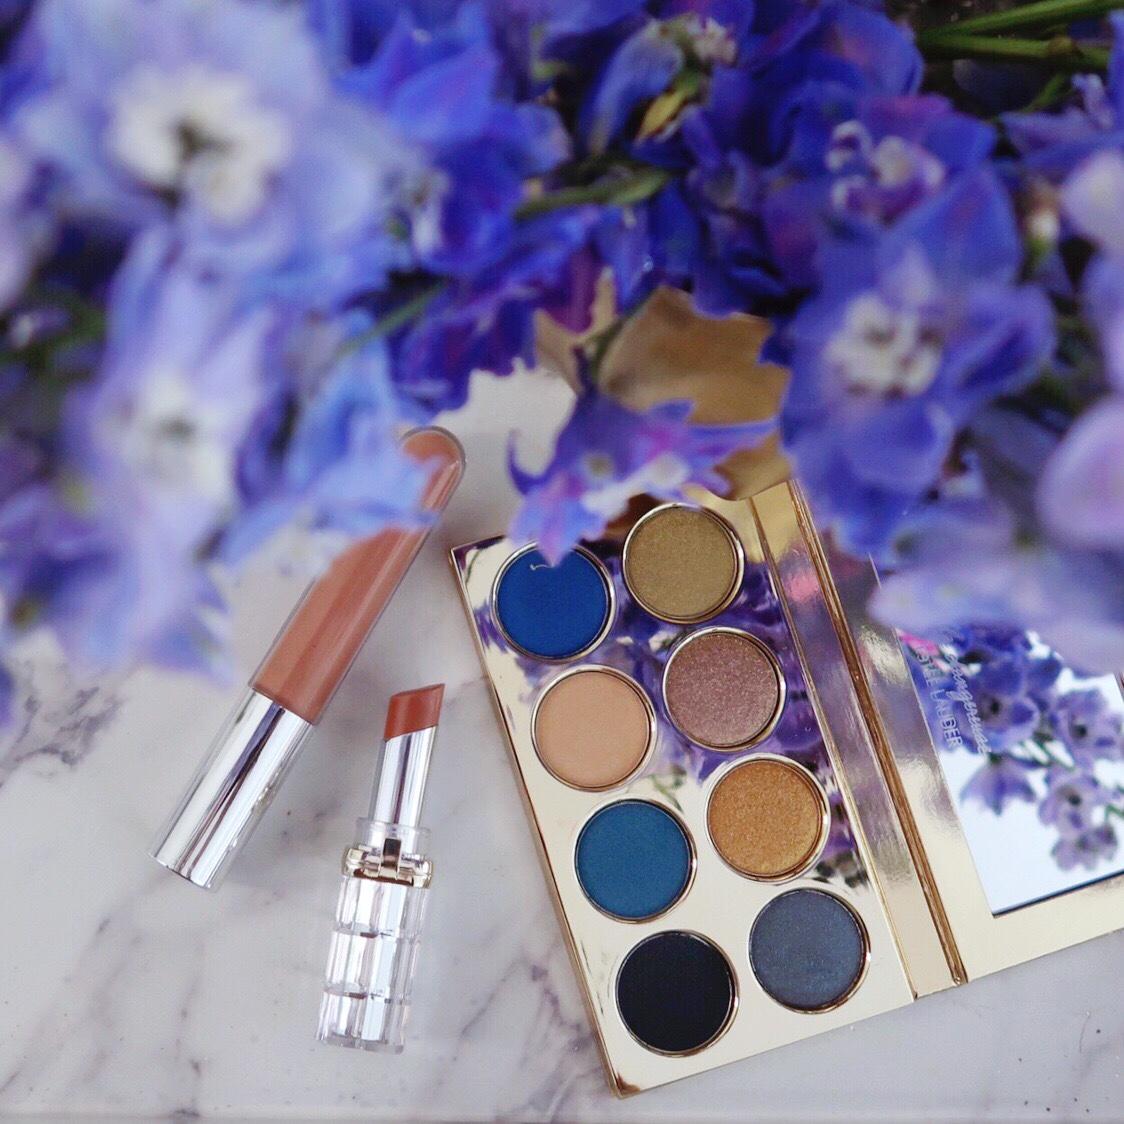 Violette Fr x Estee Lauder La Dangereuse 'Blue Dahlia' eye shadow palette on a marble tray beside of vase of fresh blue delphinium flowers, L'Oreal Colour Riche lipstick, and Becca lip gloss.